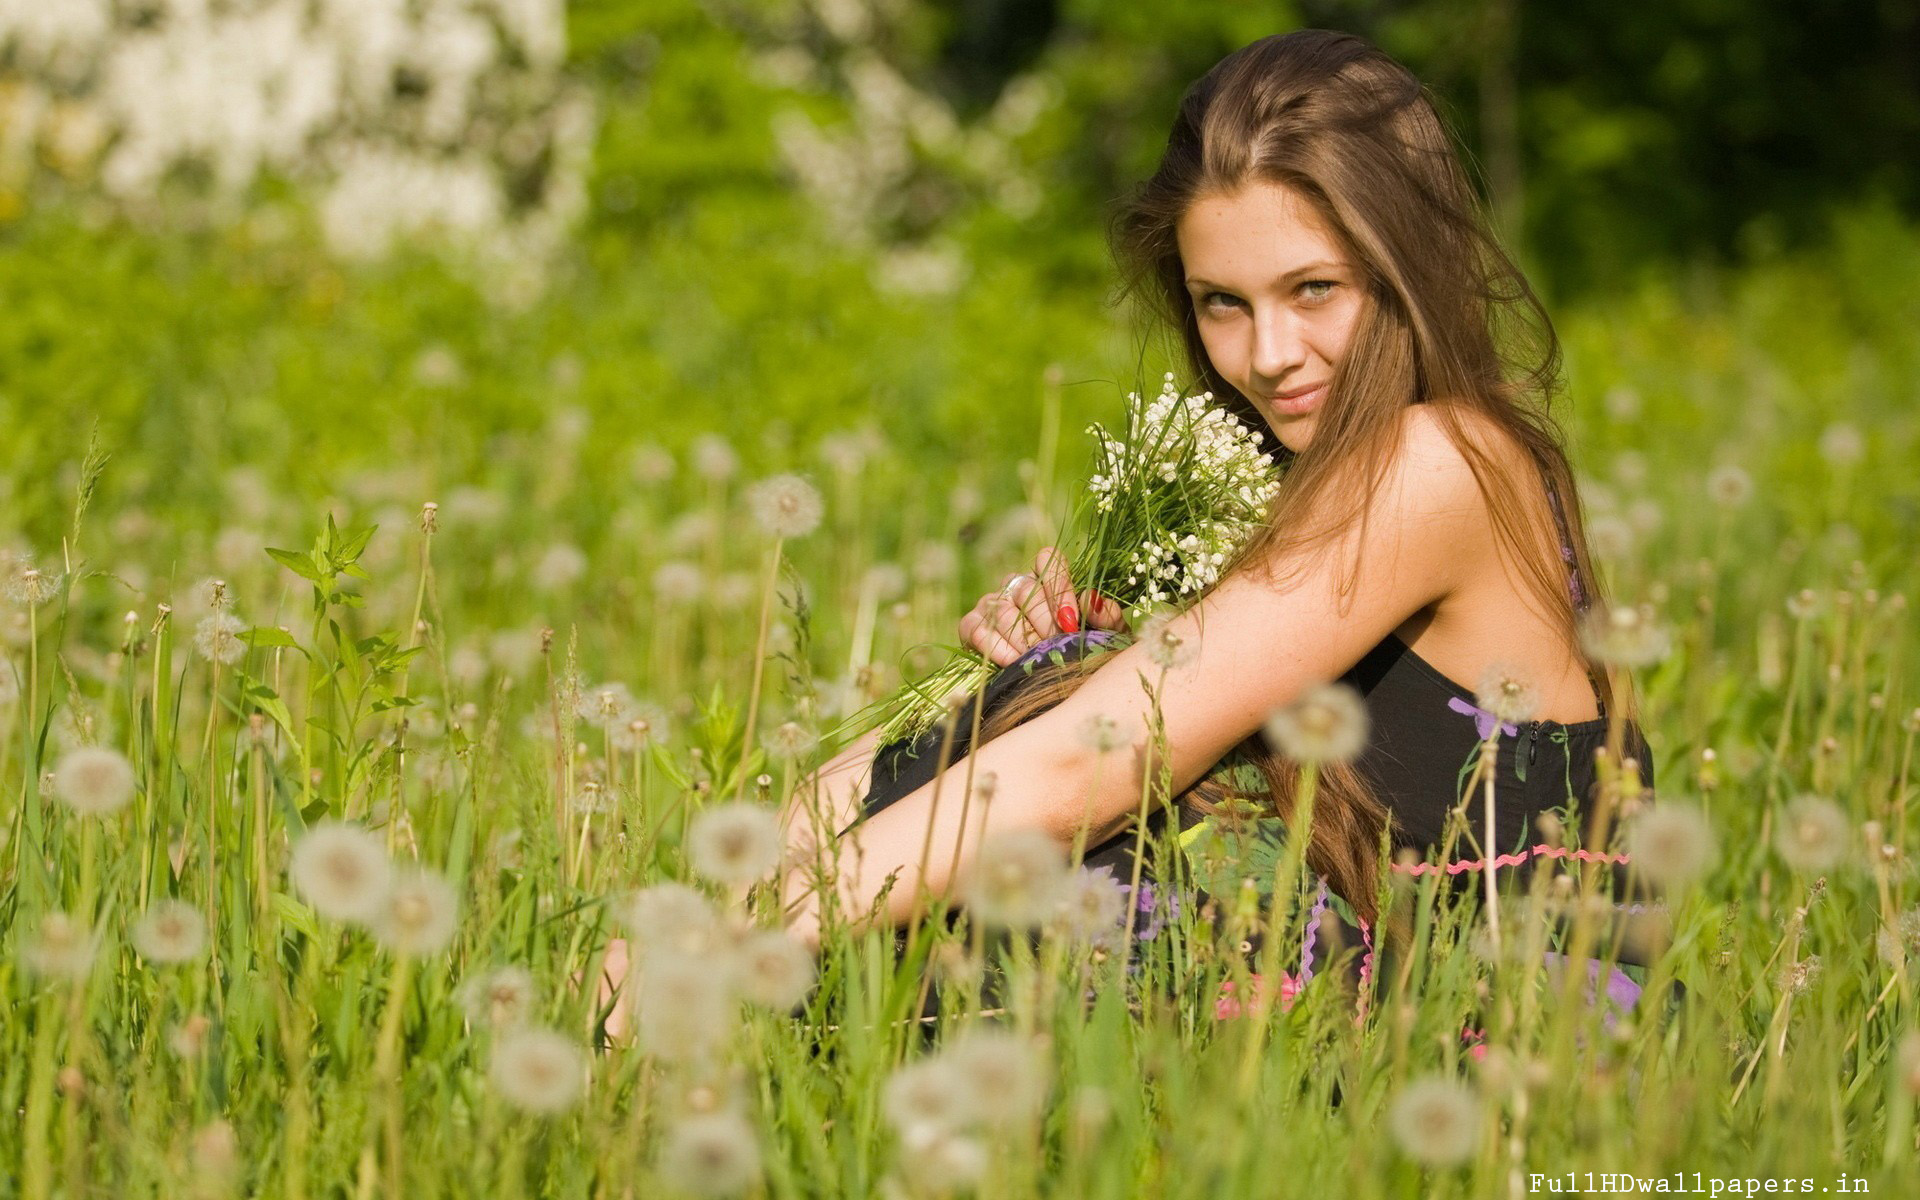 Girl In Nature Wallpaper